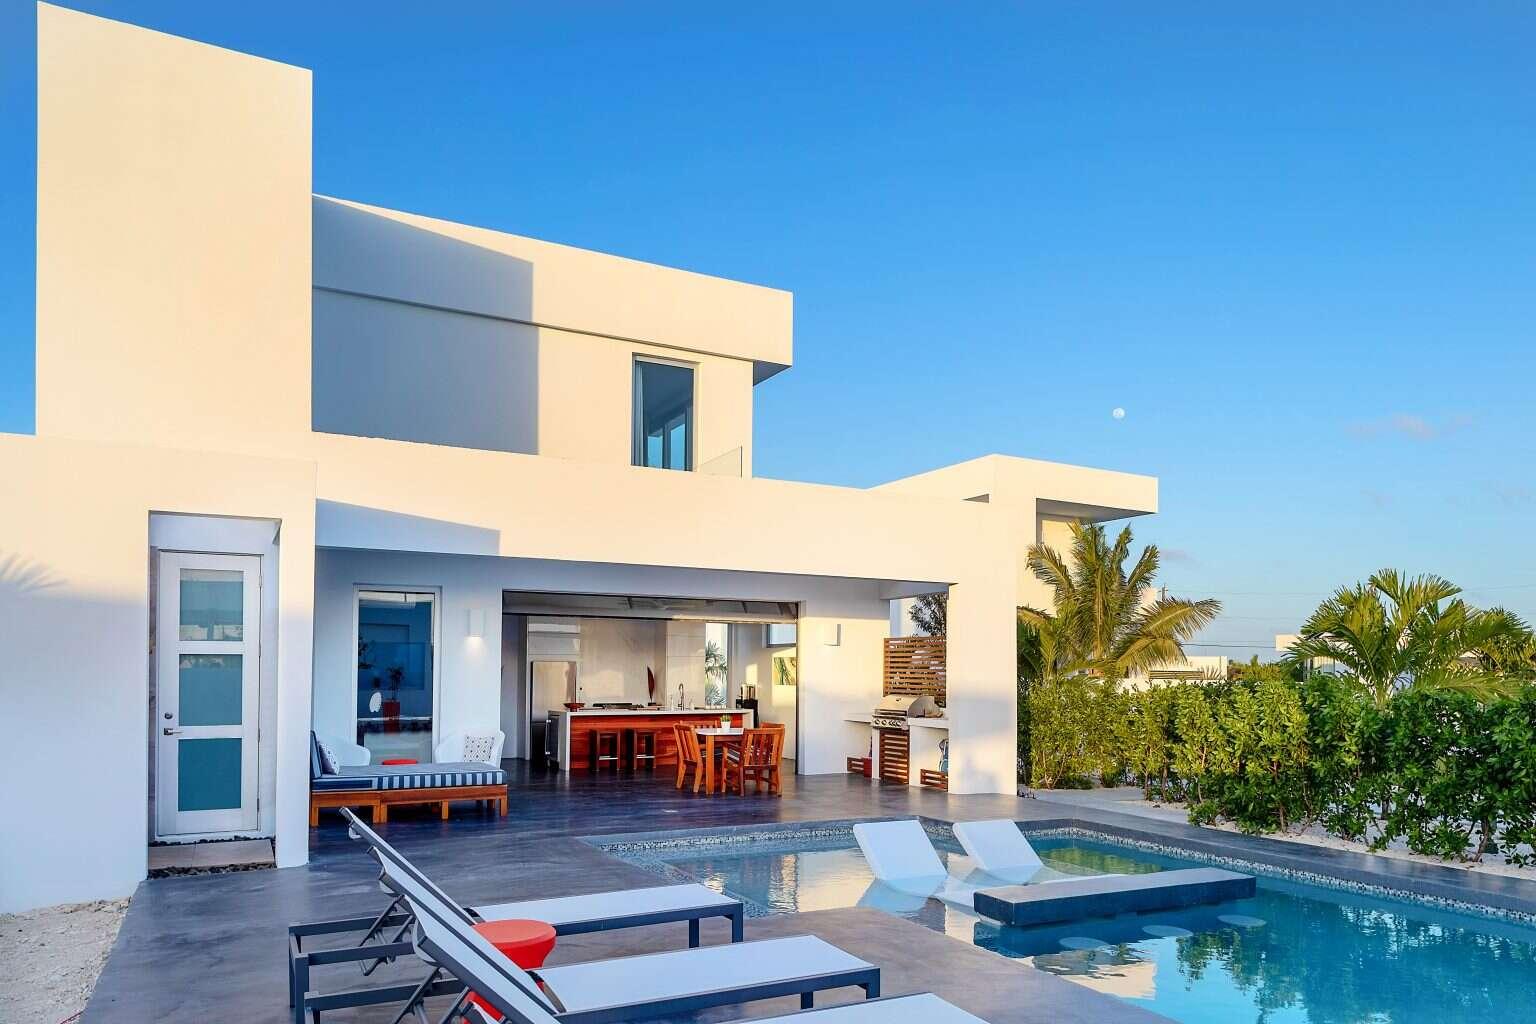 - White Villa 3 - Image 1/12